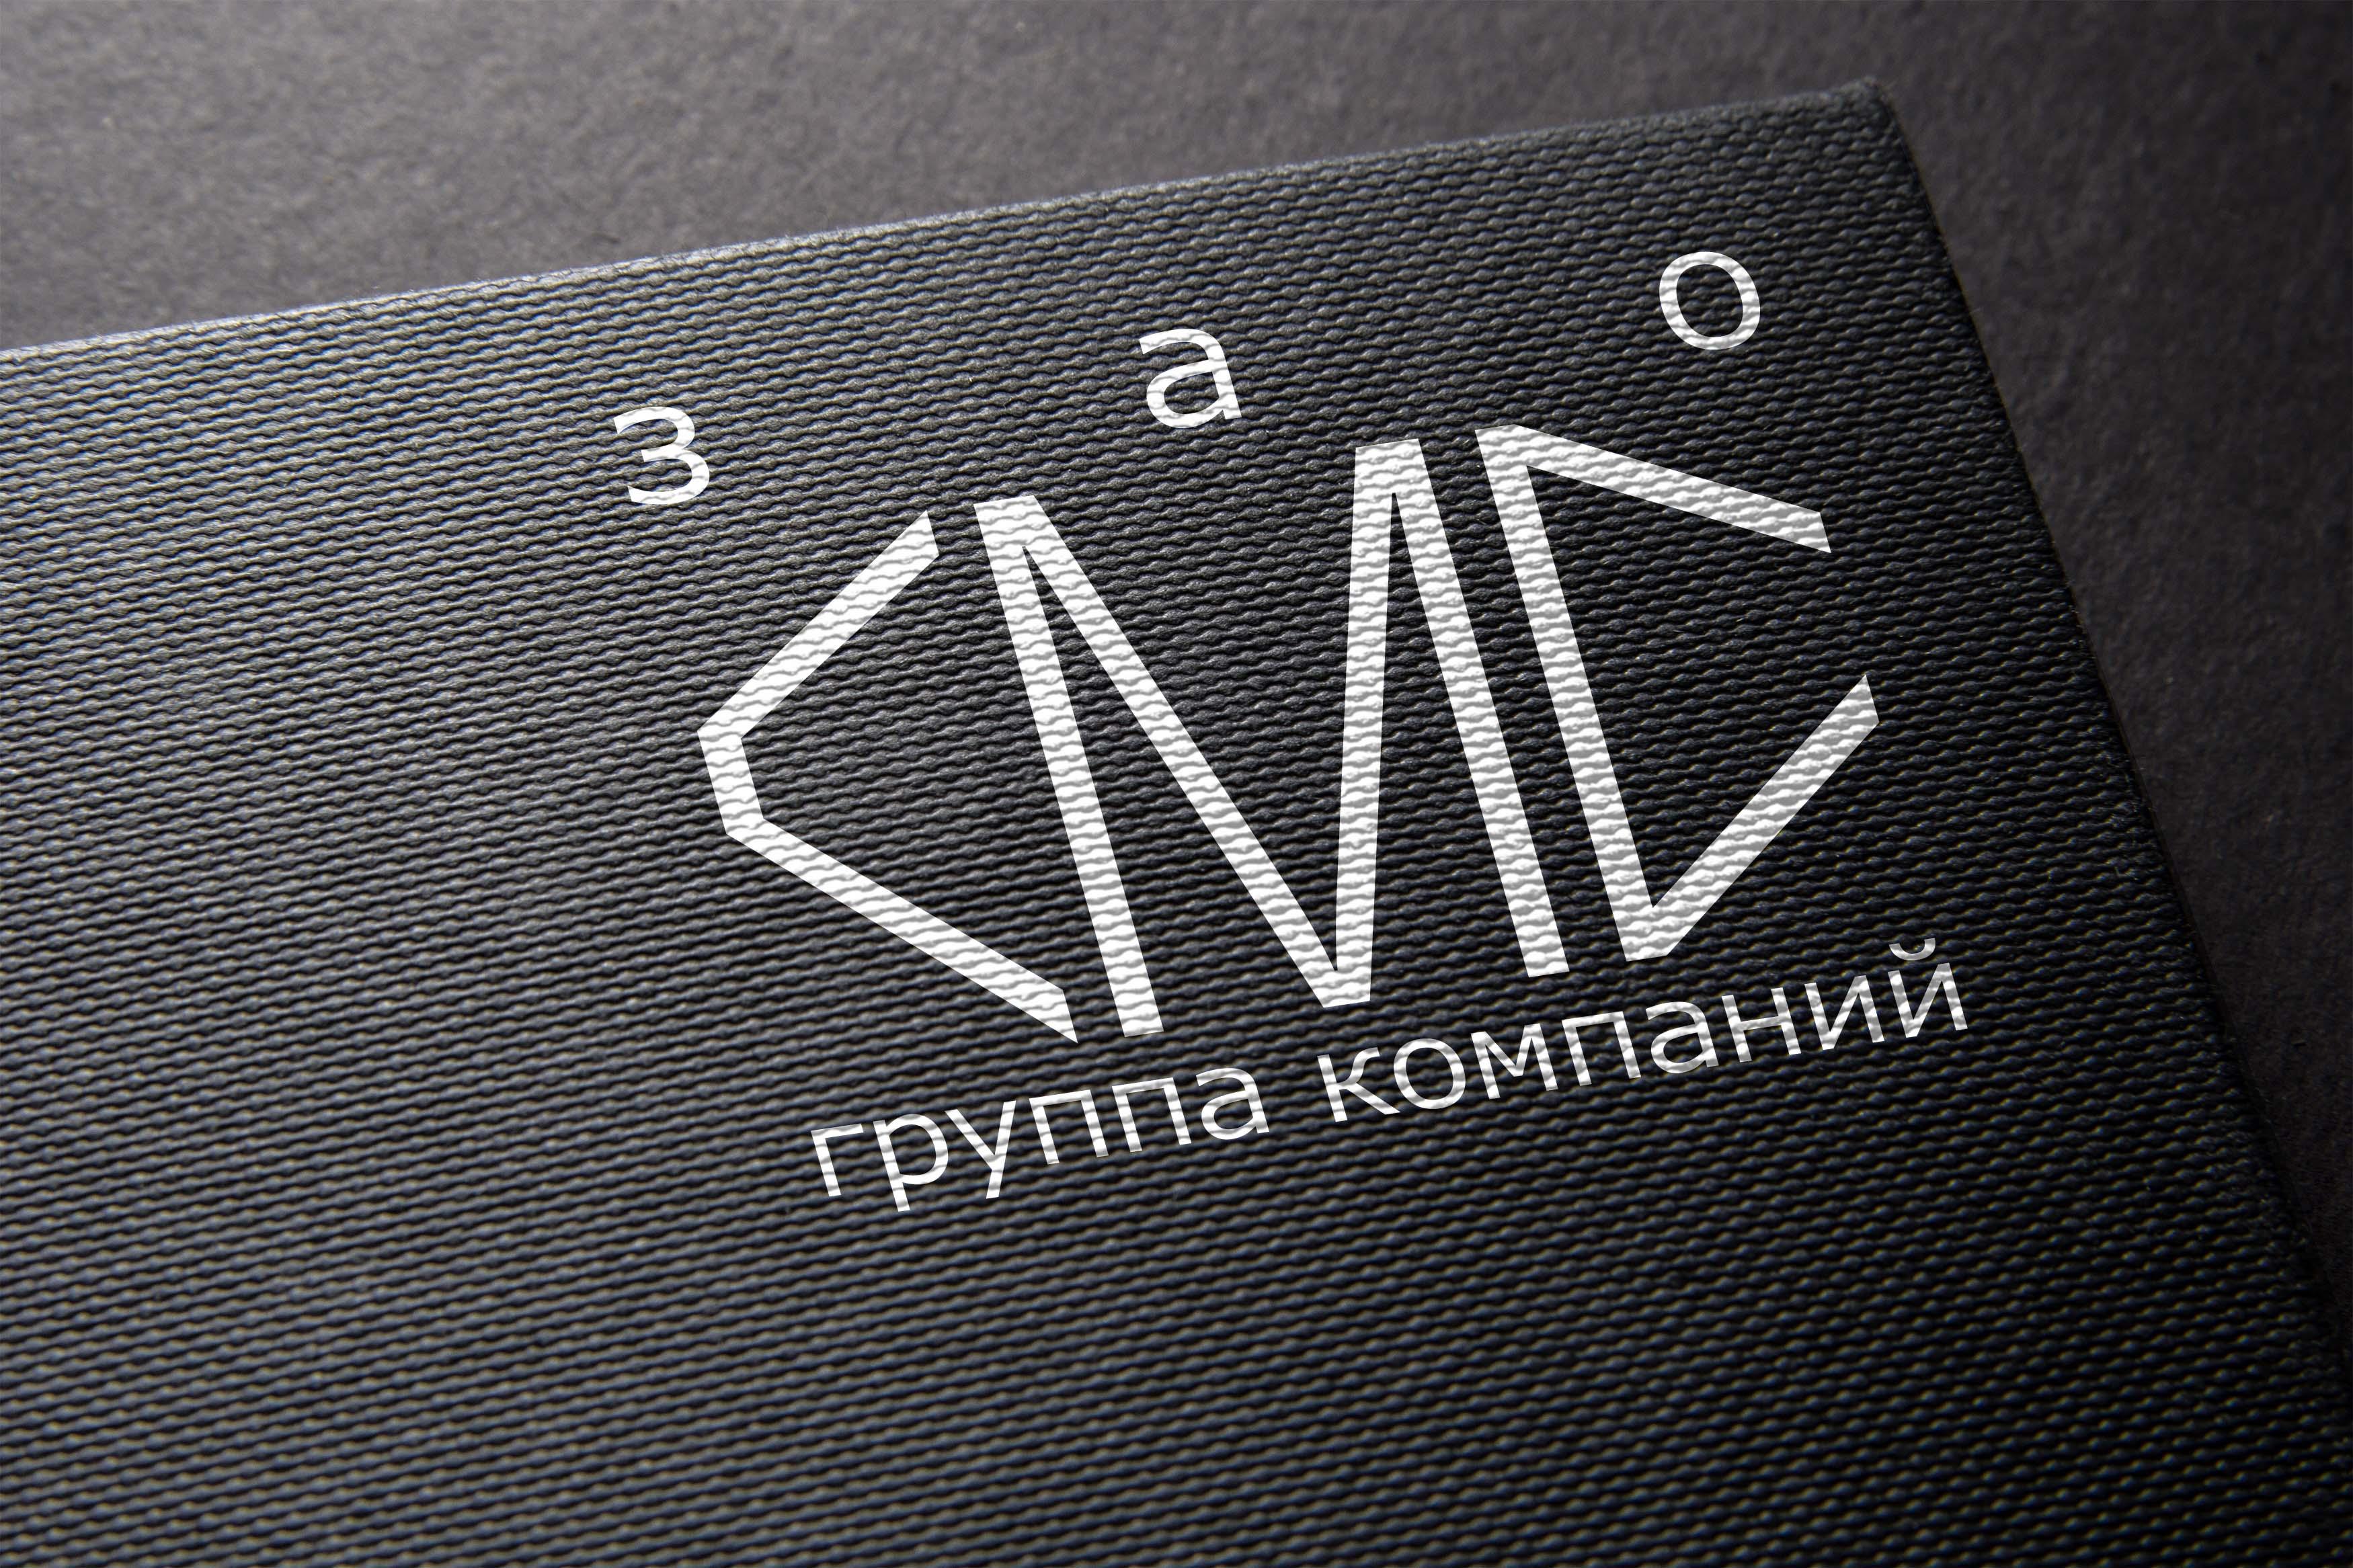 Дизайнер для разработки Логотипа для организации !СРОЧНО! фото f_5765a2a581b28557.jpg